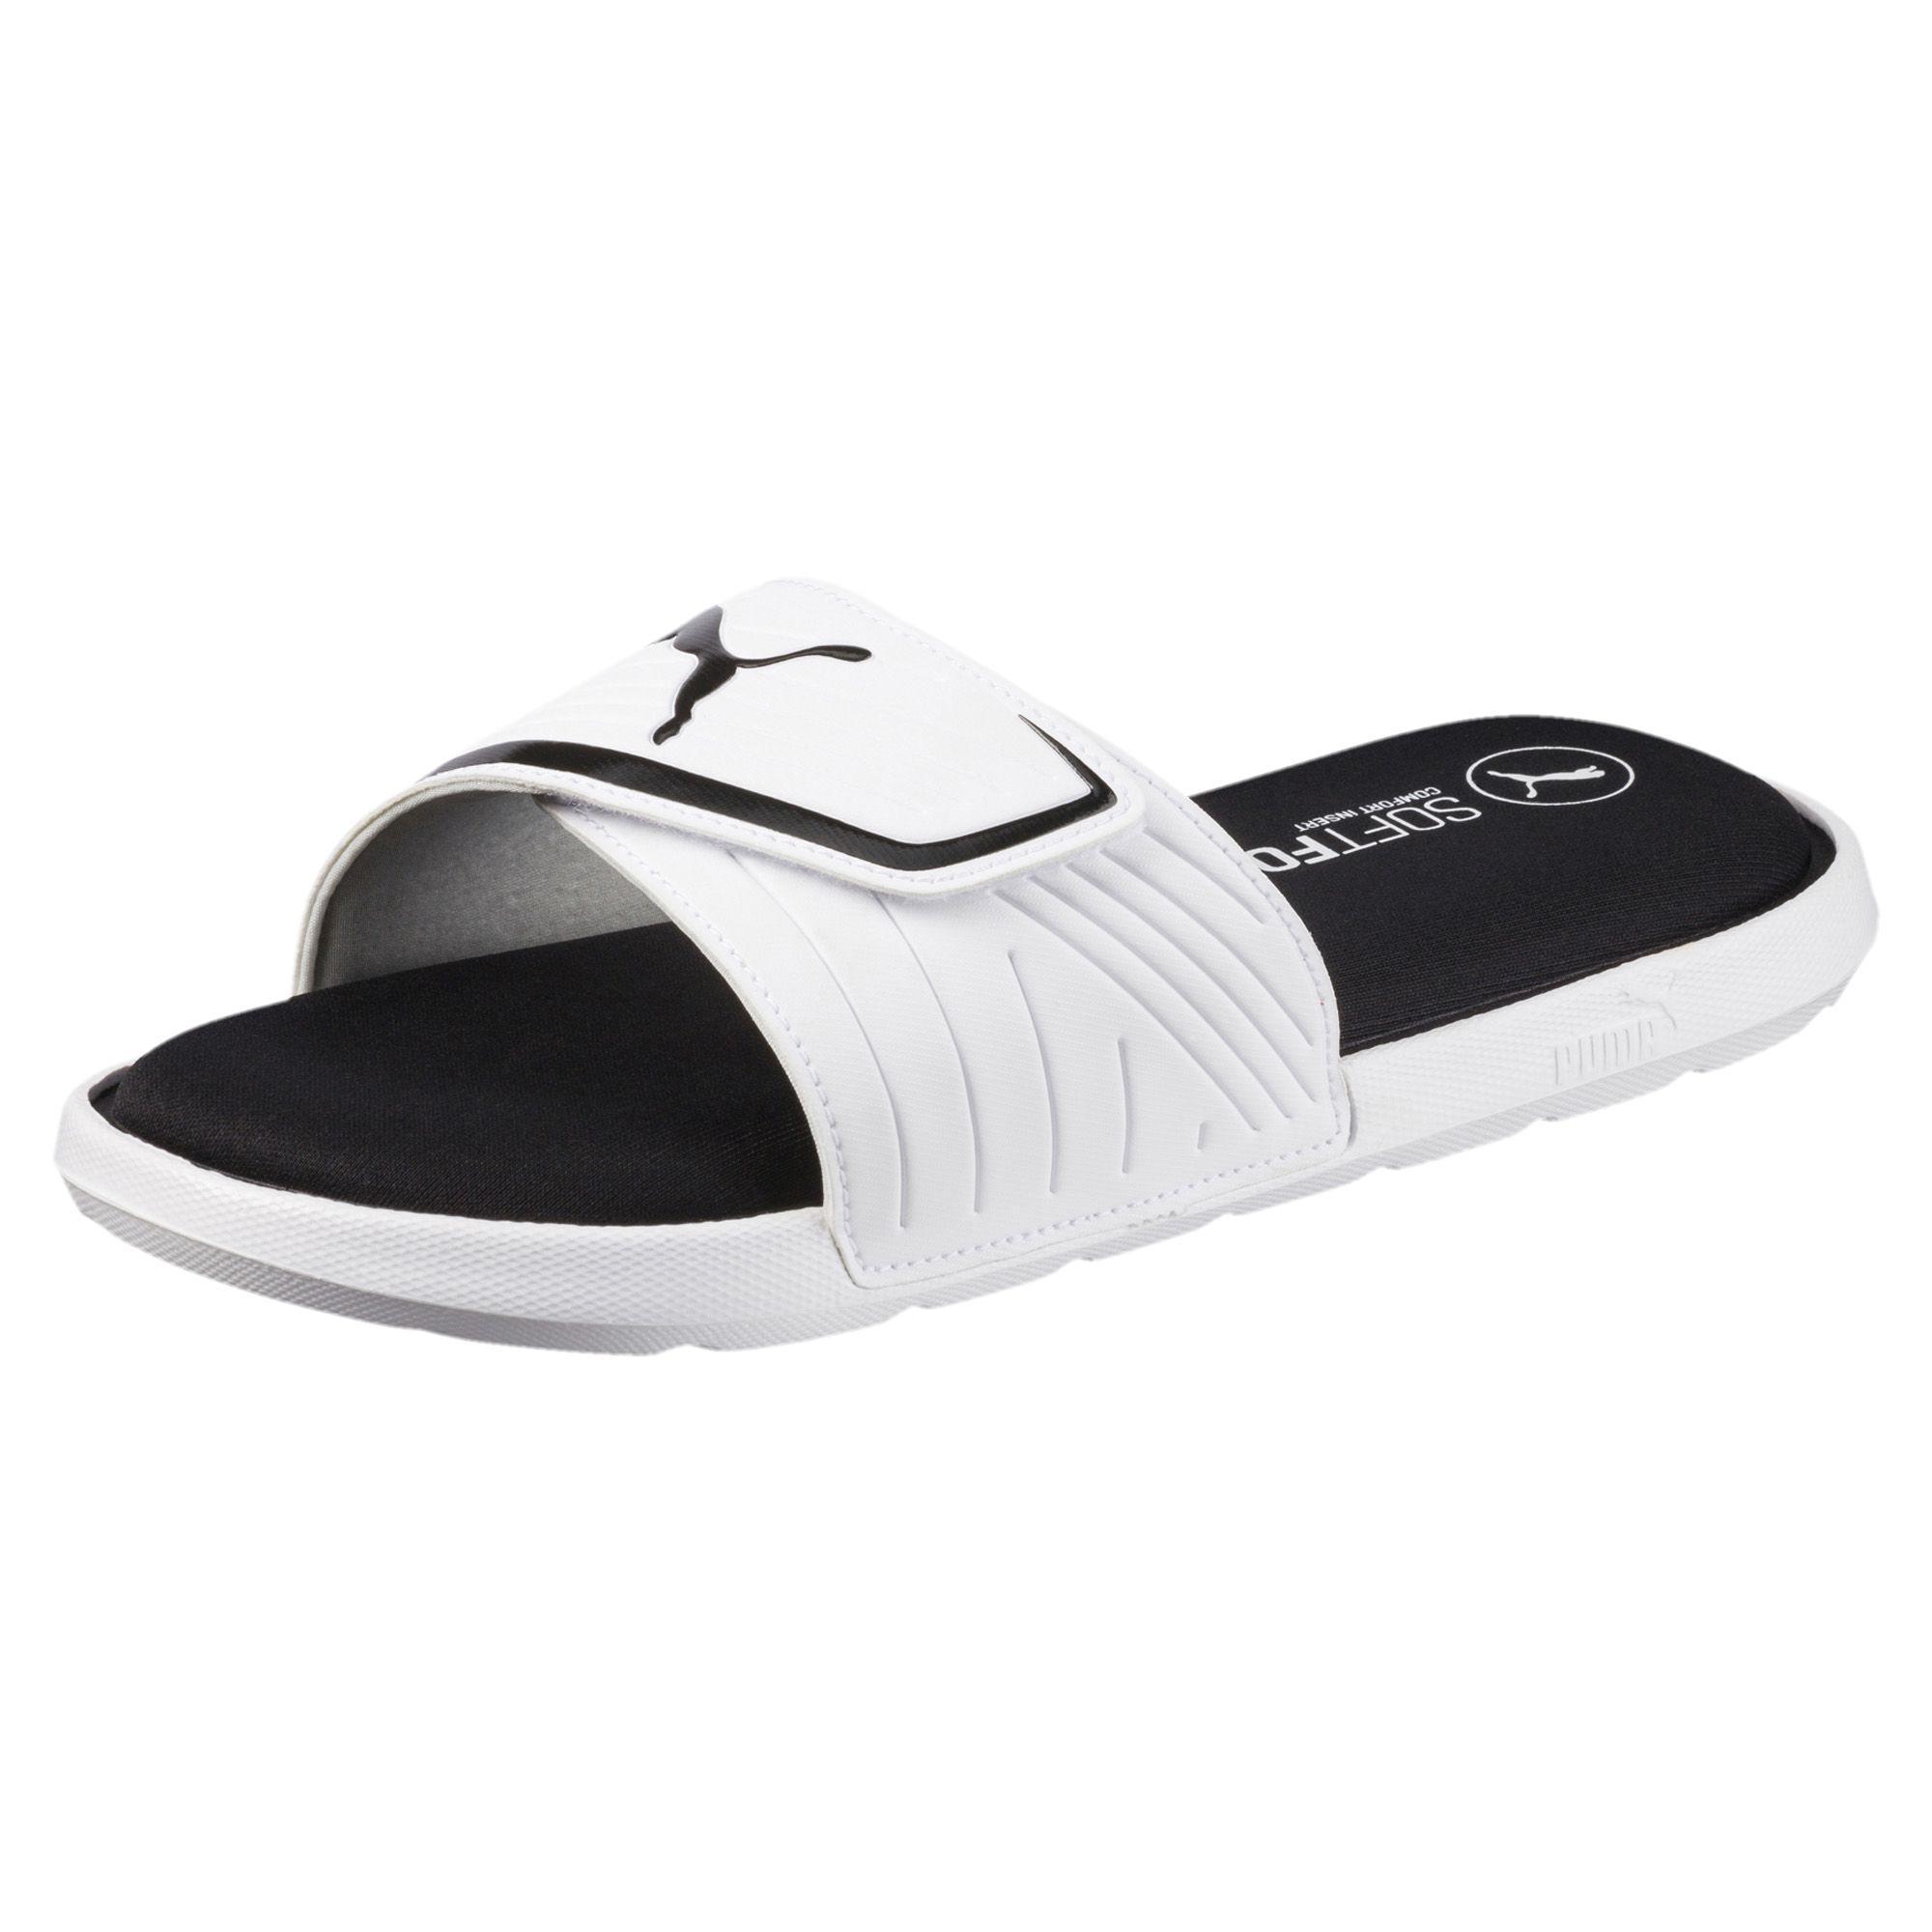 7b84abeb8fb44 Lyst - PUMA Starcat Softfoam Men s Sandals in White for Men